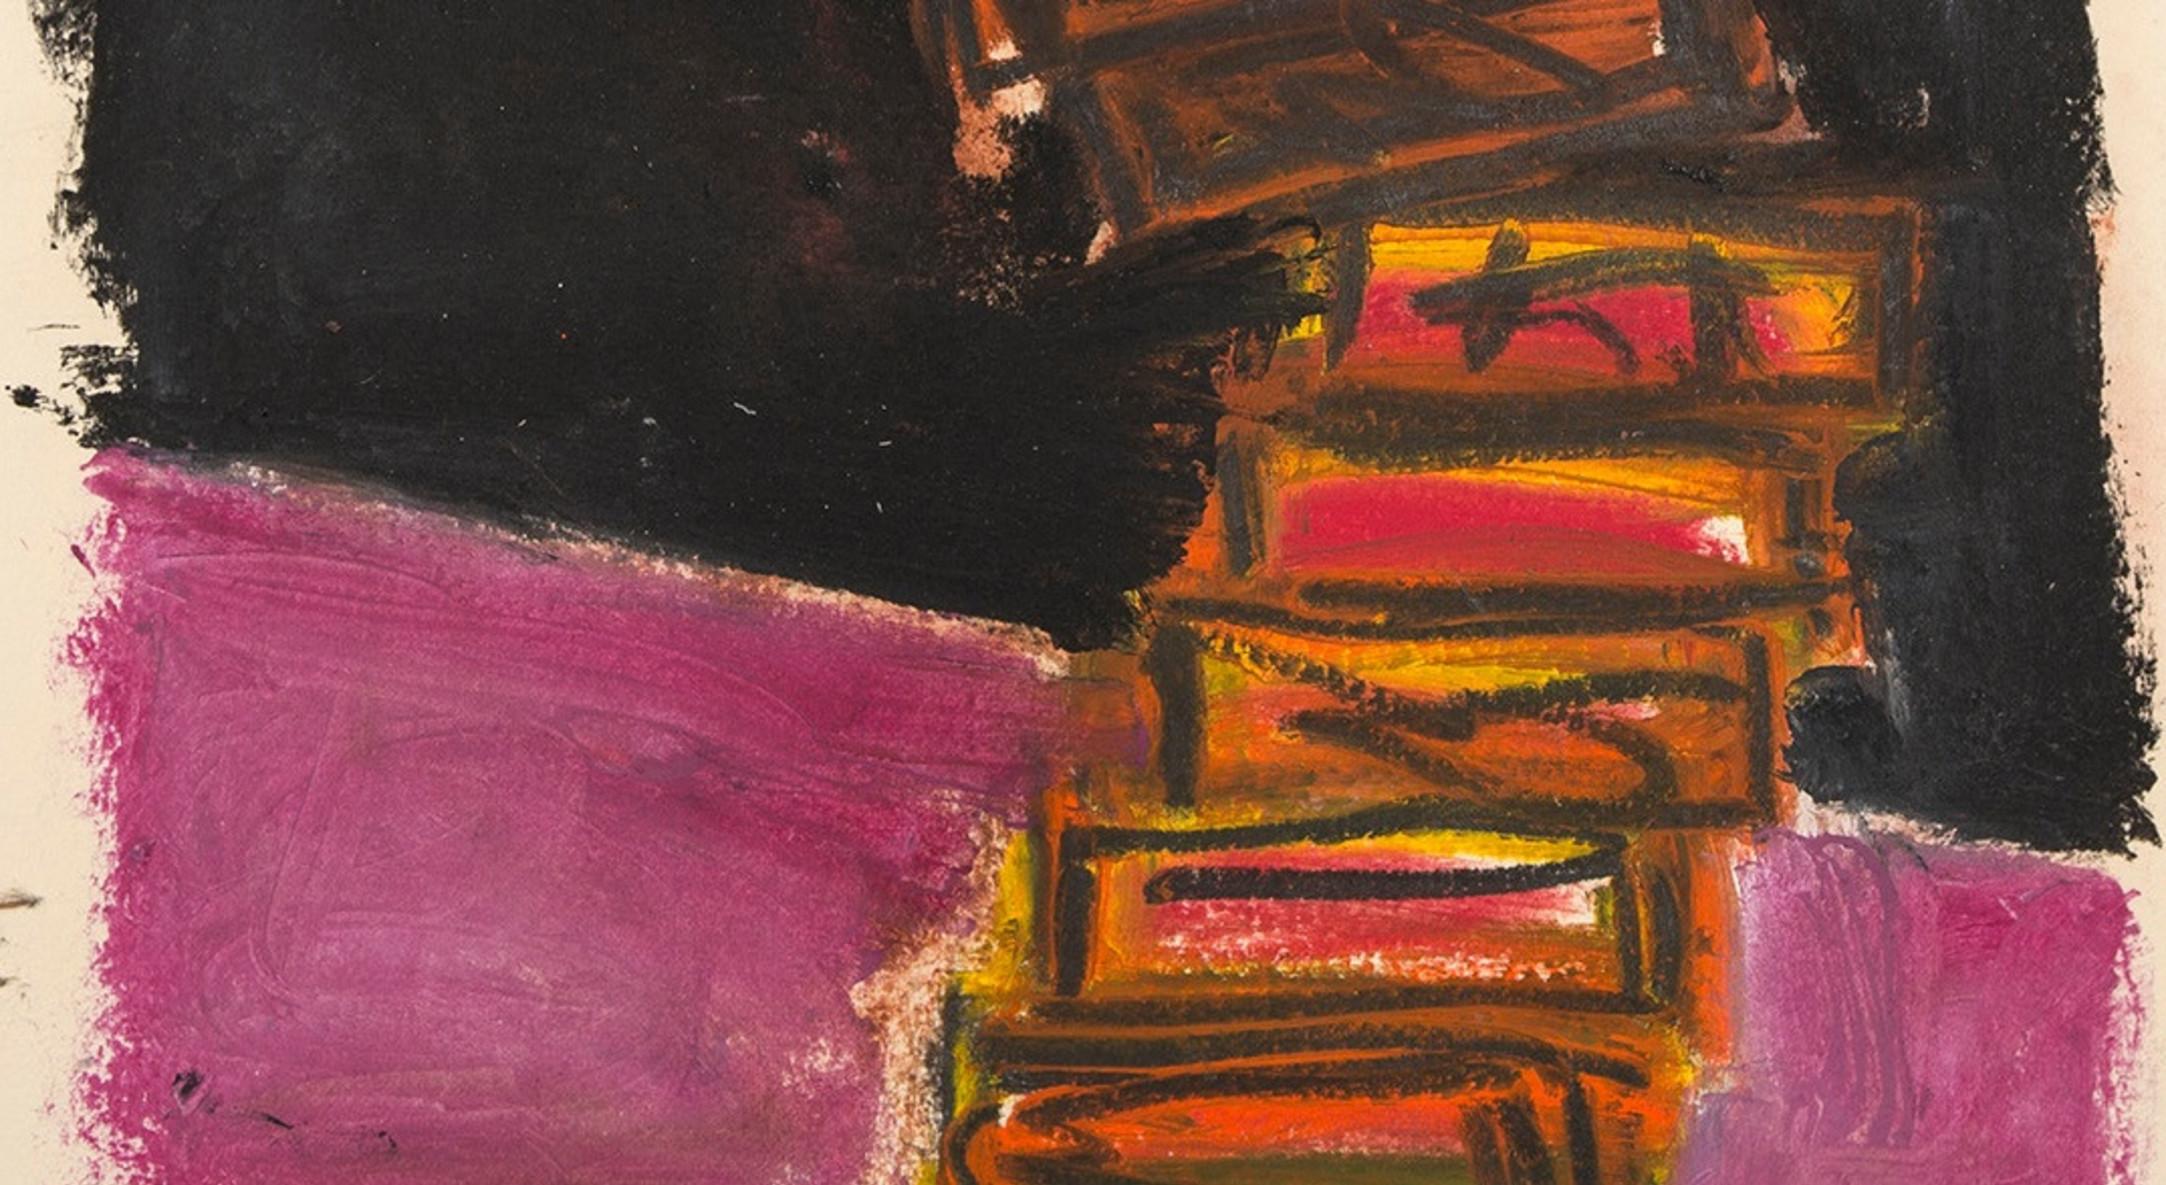 Detail of Basil Beattie, Ladder Series 1, 2017, oil on paper